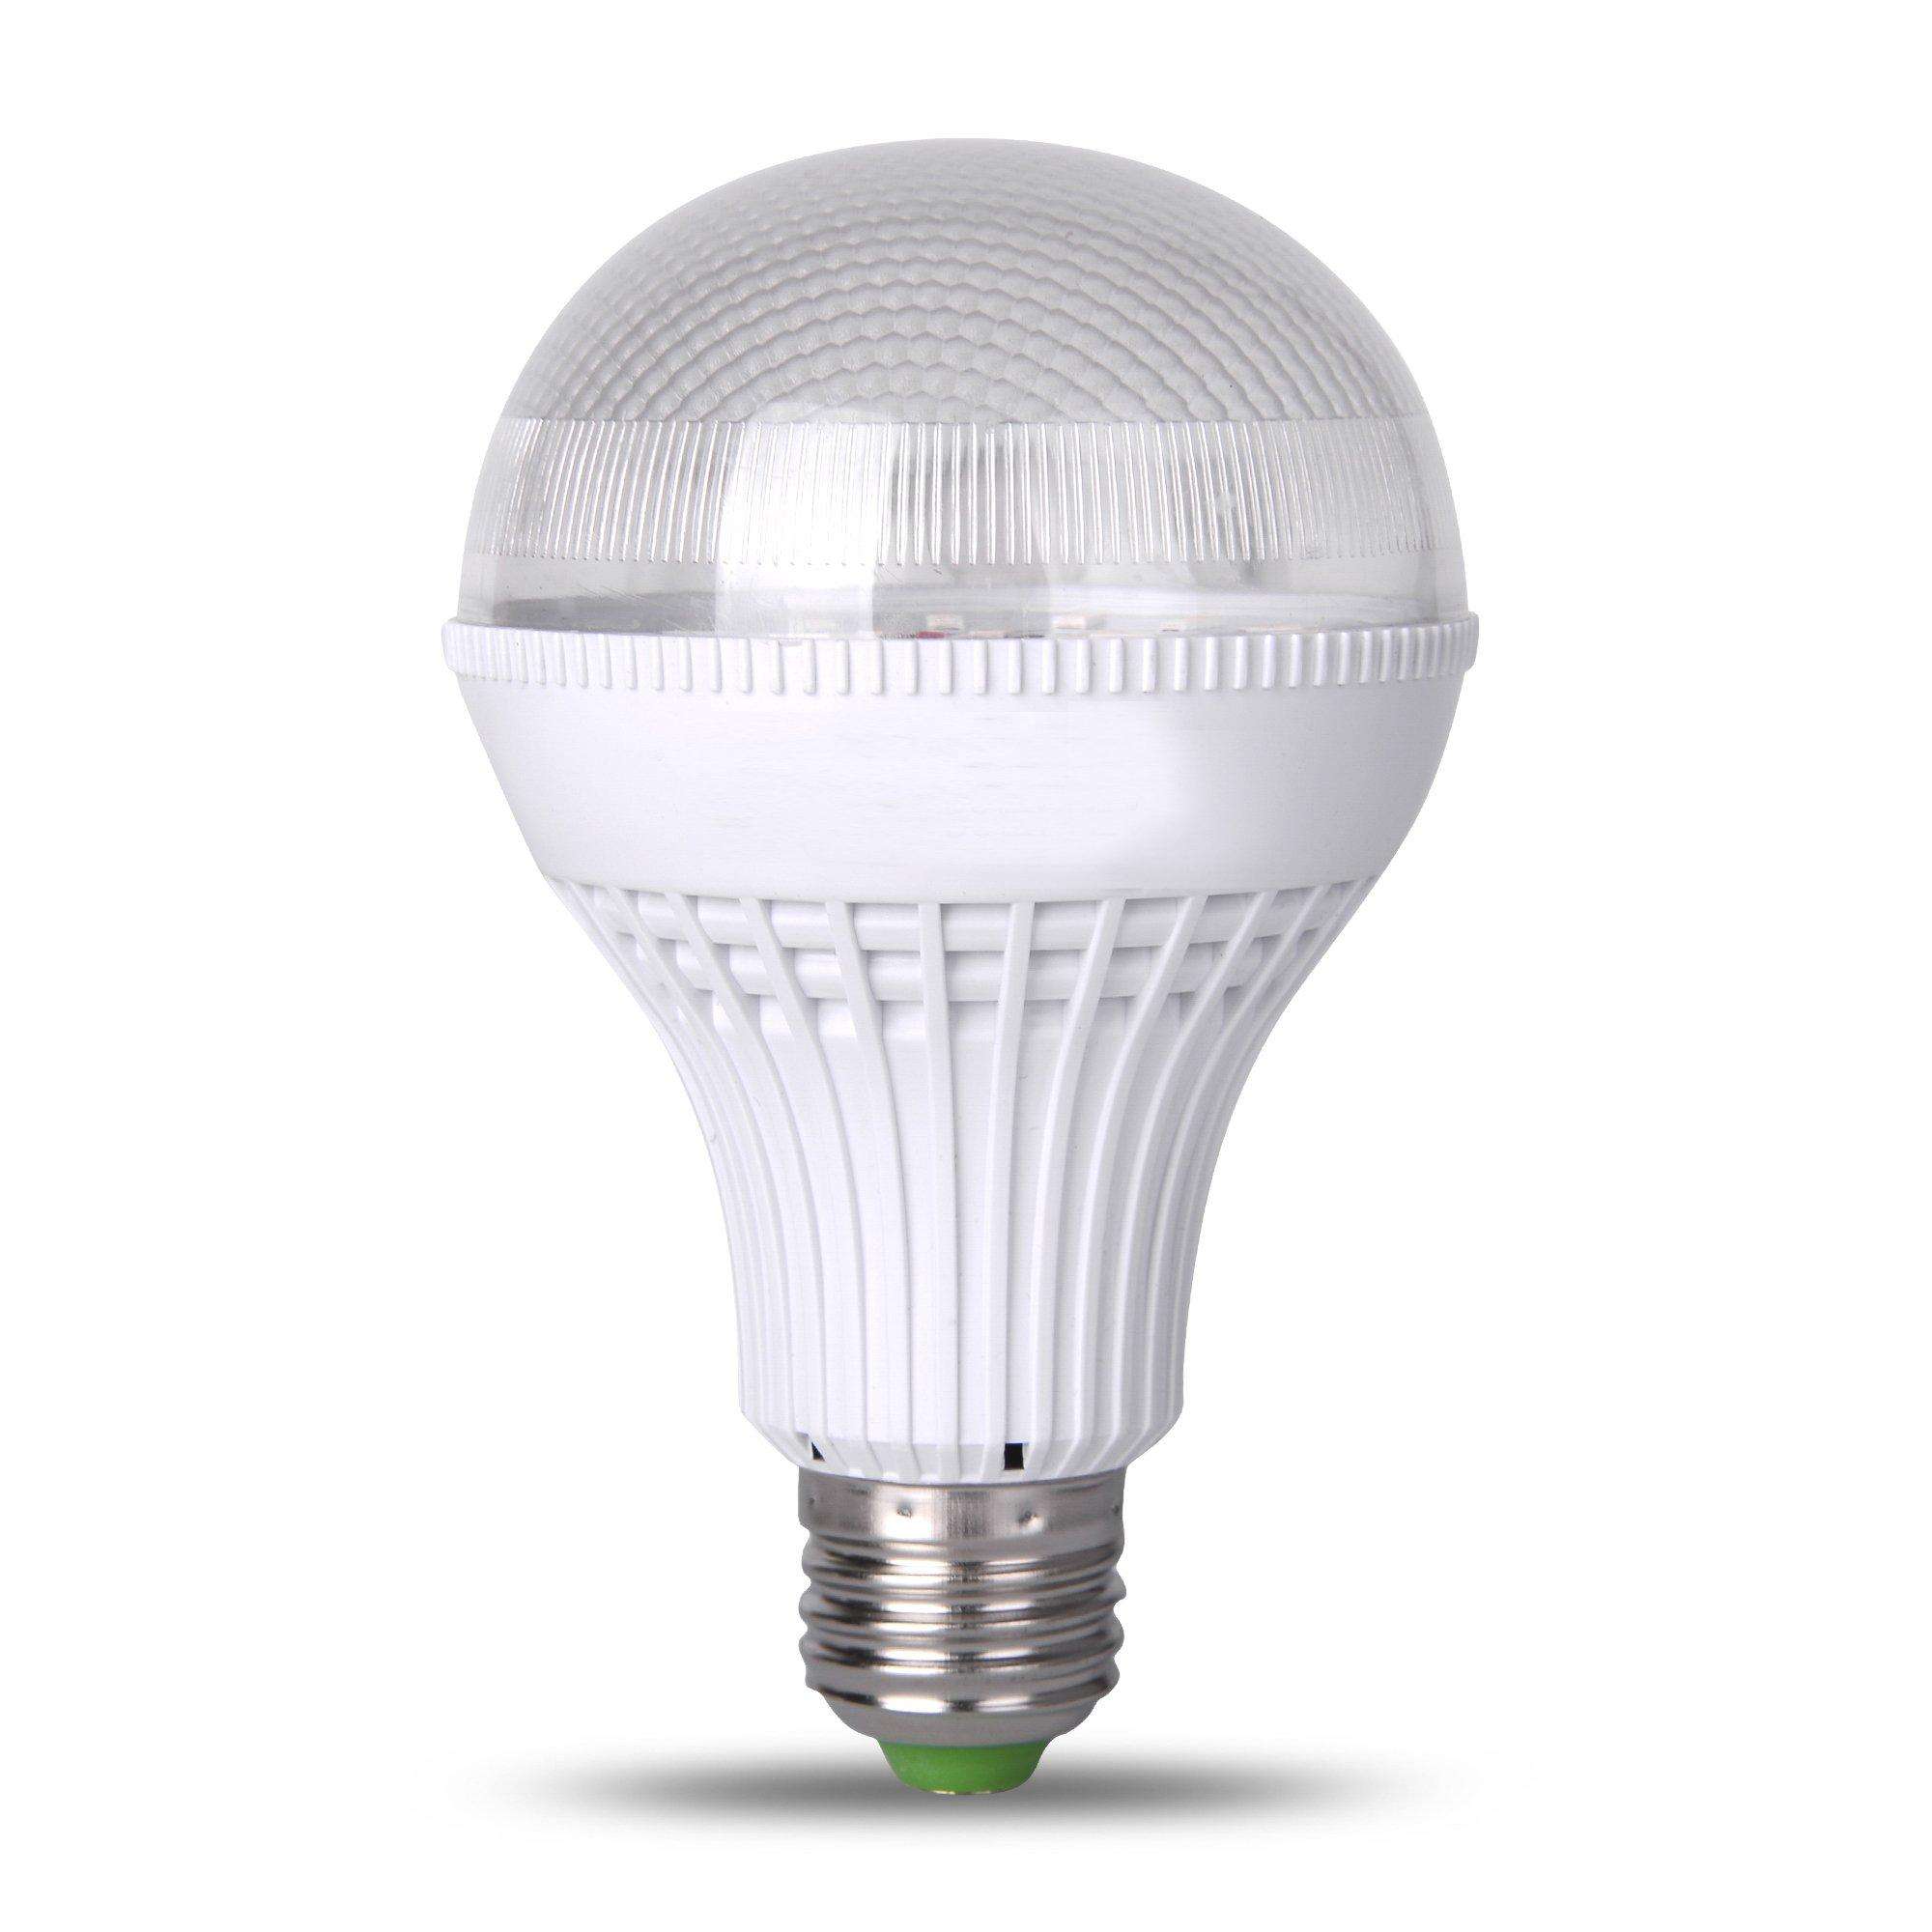 Led Bulb Dc: DC 12V-24V LED Light Bulb Recess Low Voltage 12W =75W E26